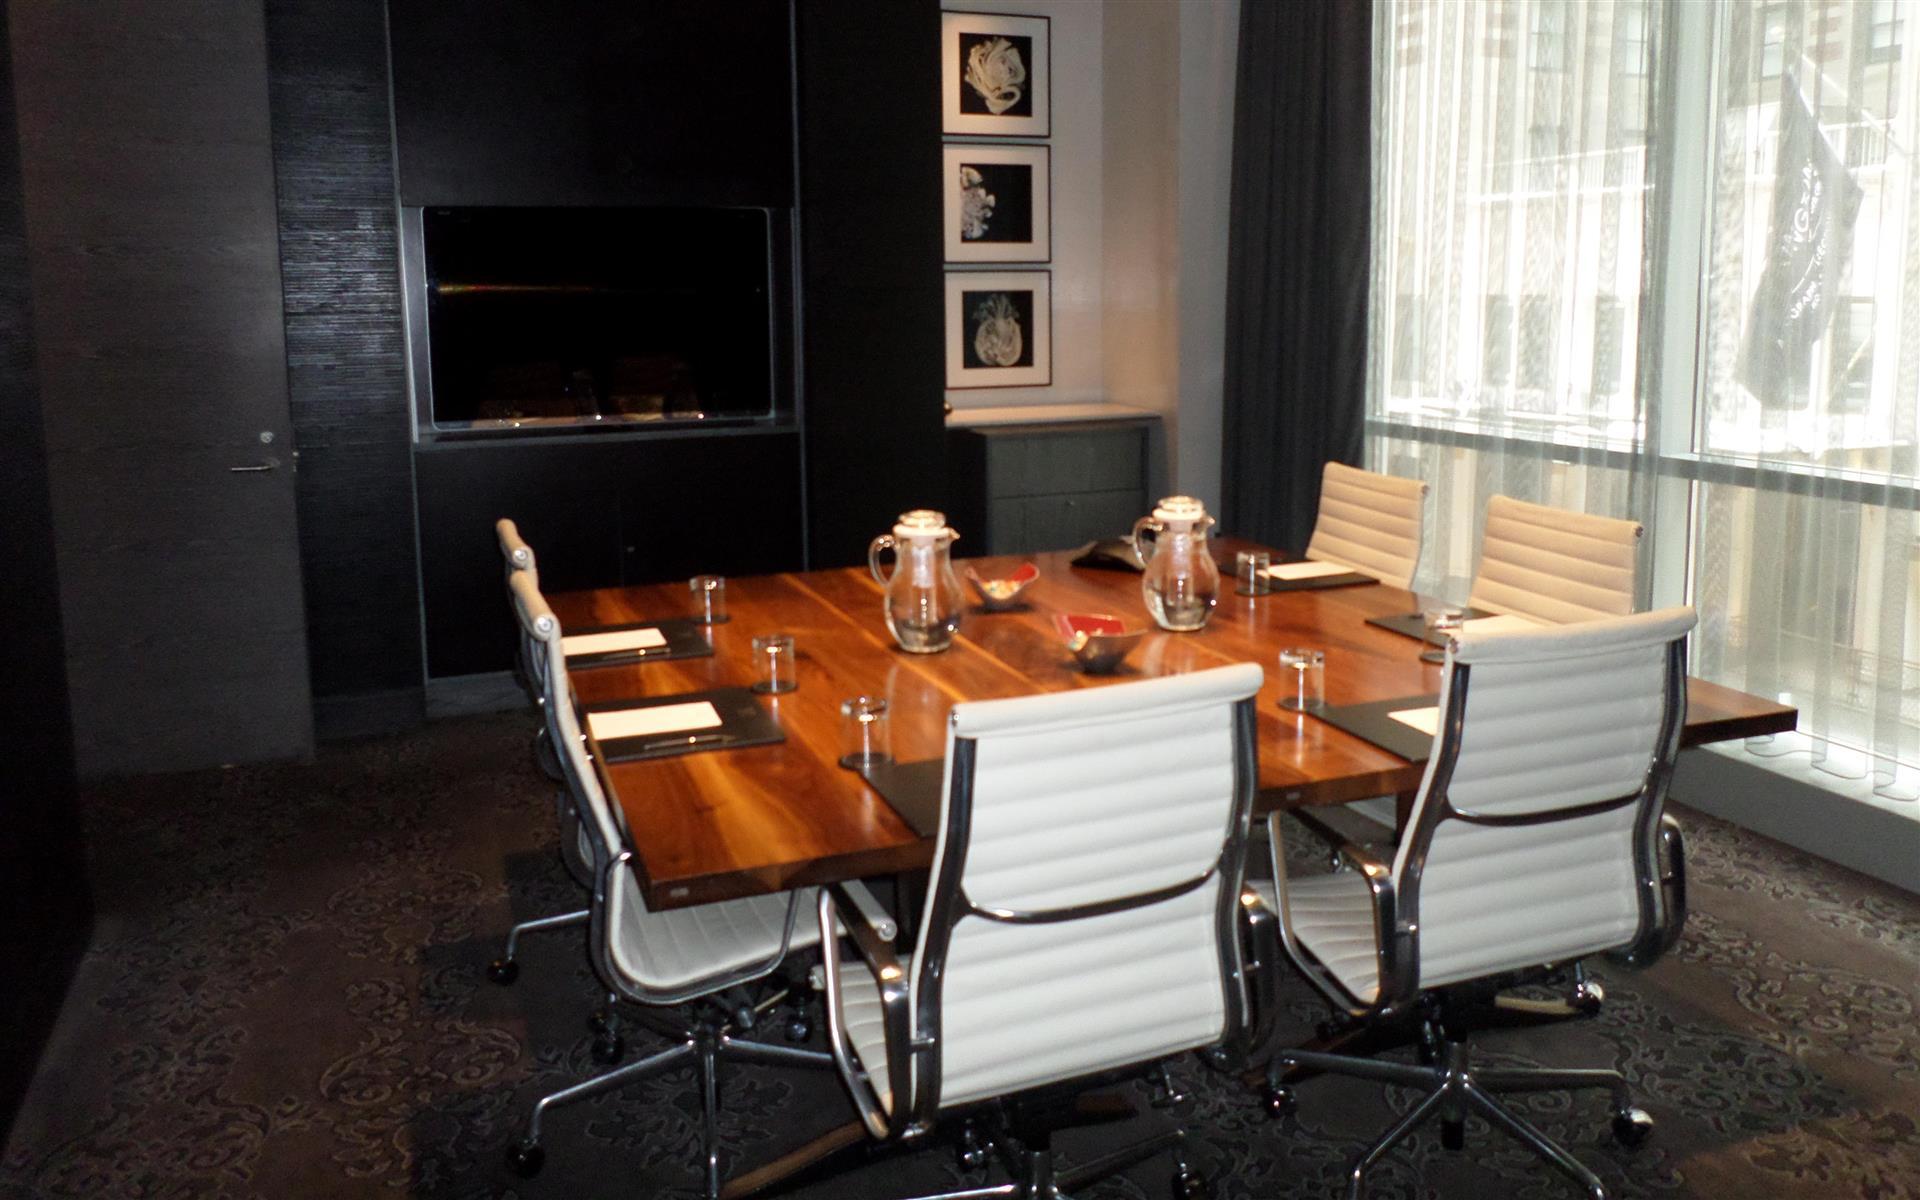 Hotel 48 Lex - Boardroom 4